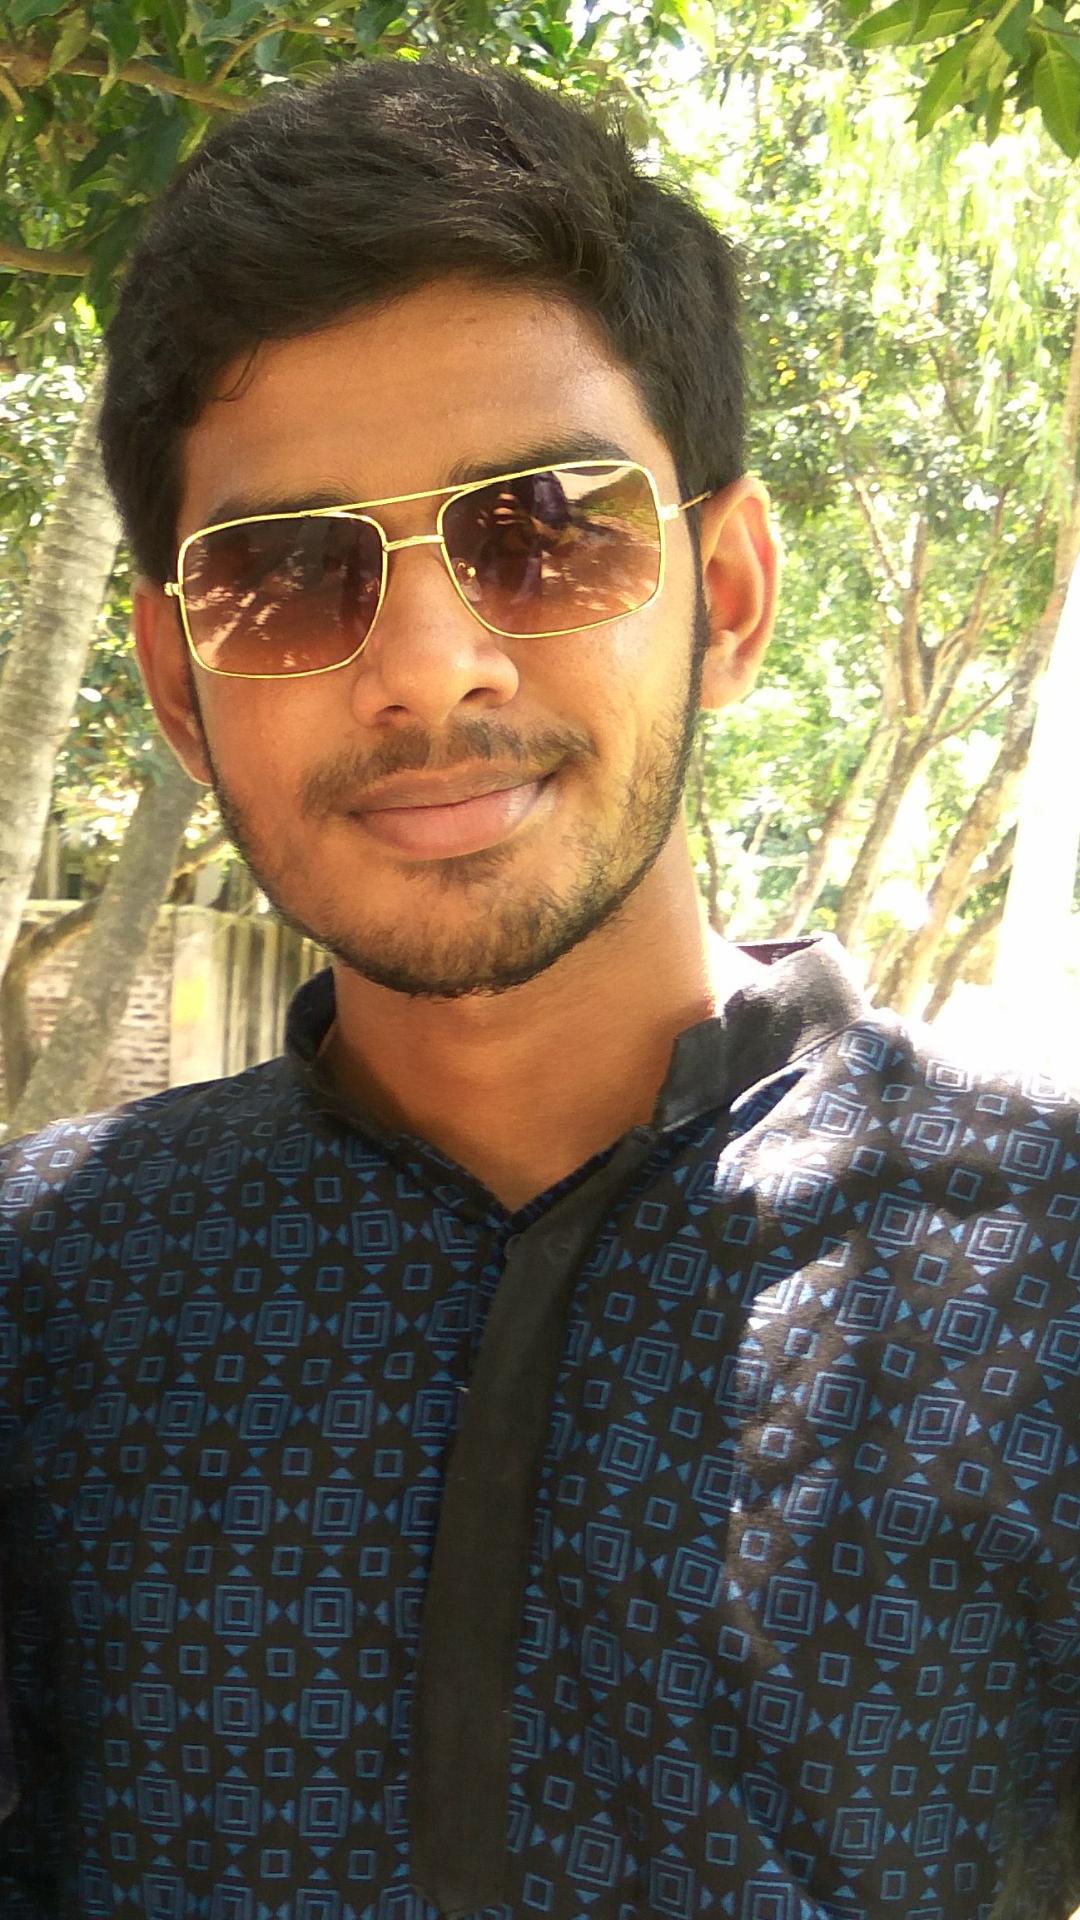 m.imran.sheikh007